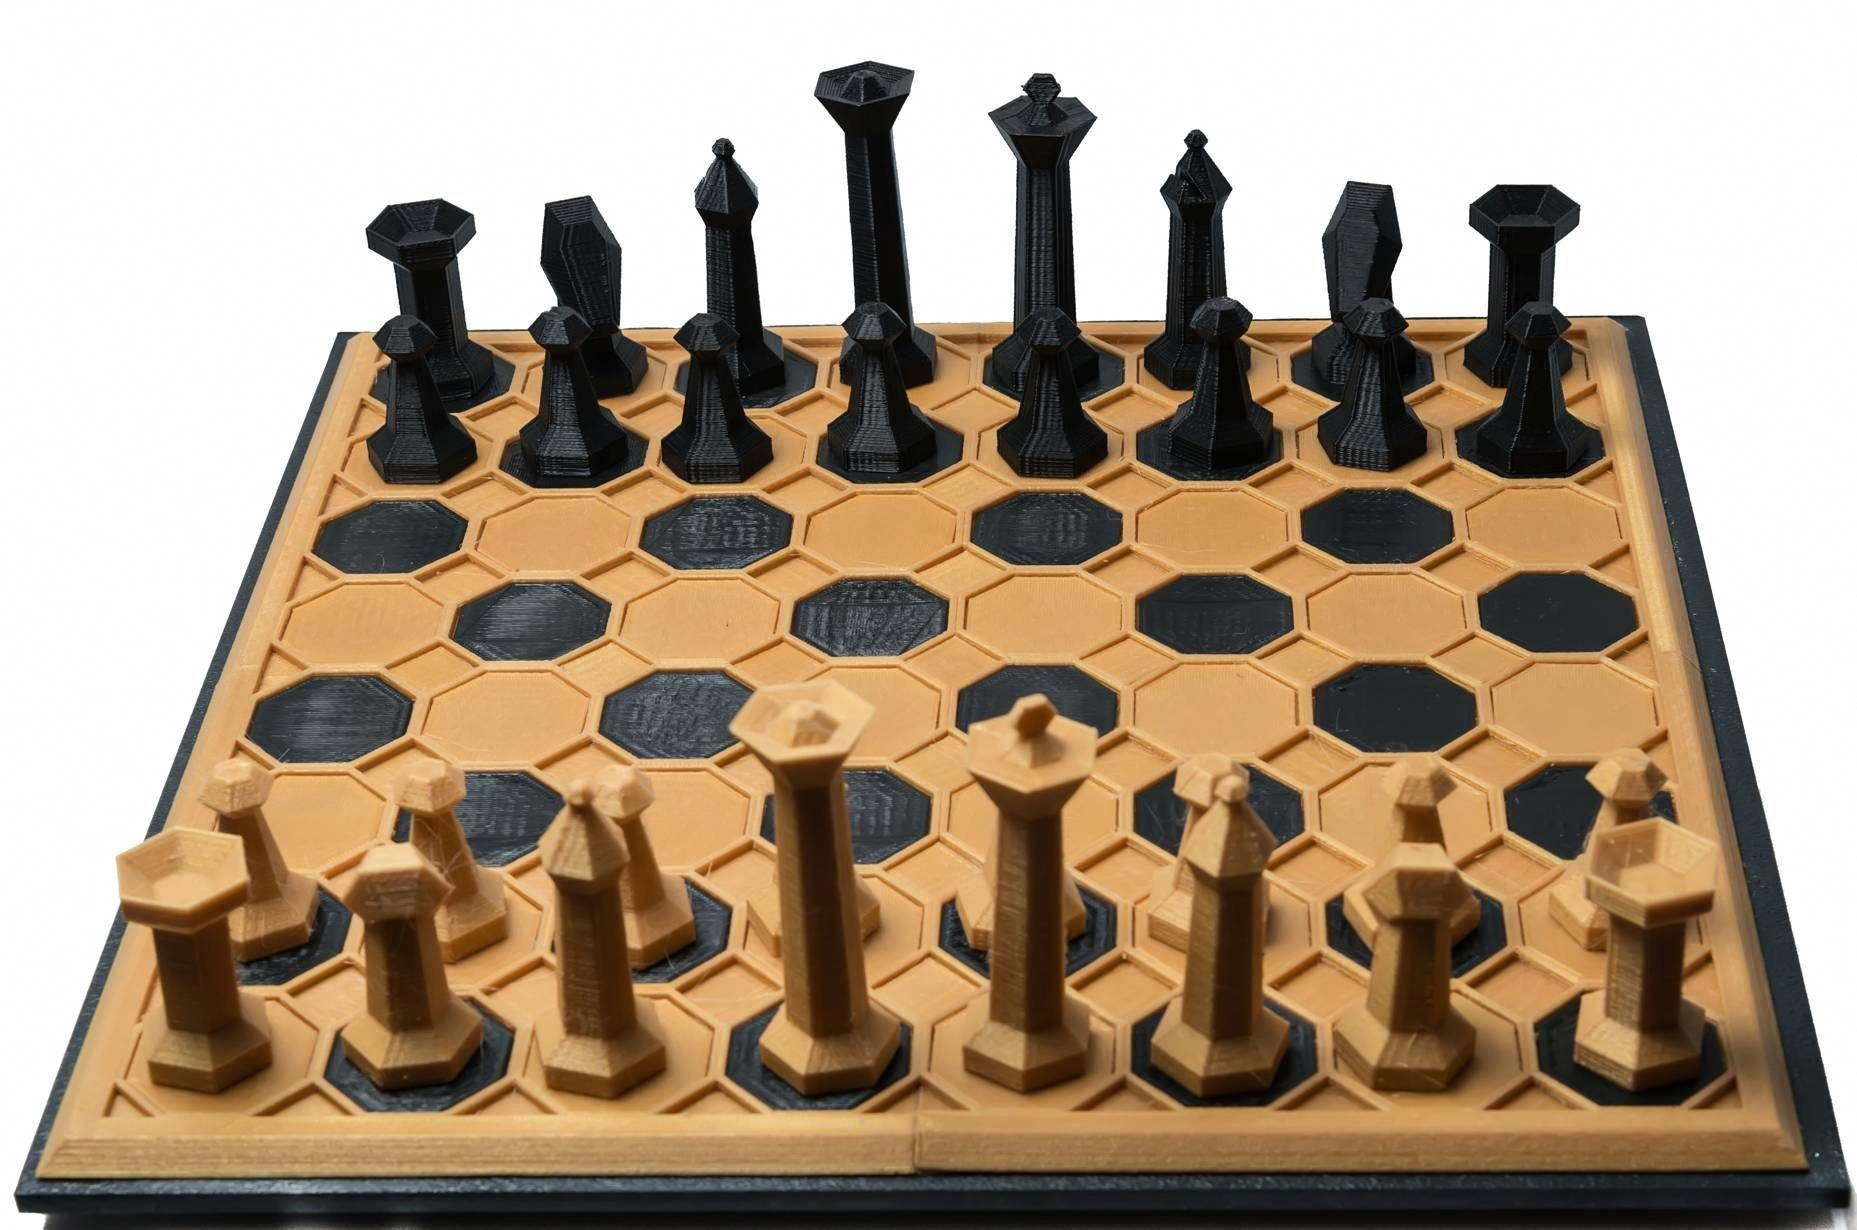 Chess Board 15x15 3D Printed Chess set AllThingsChess